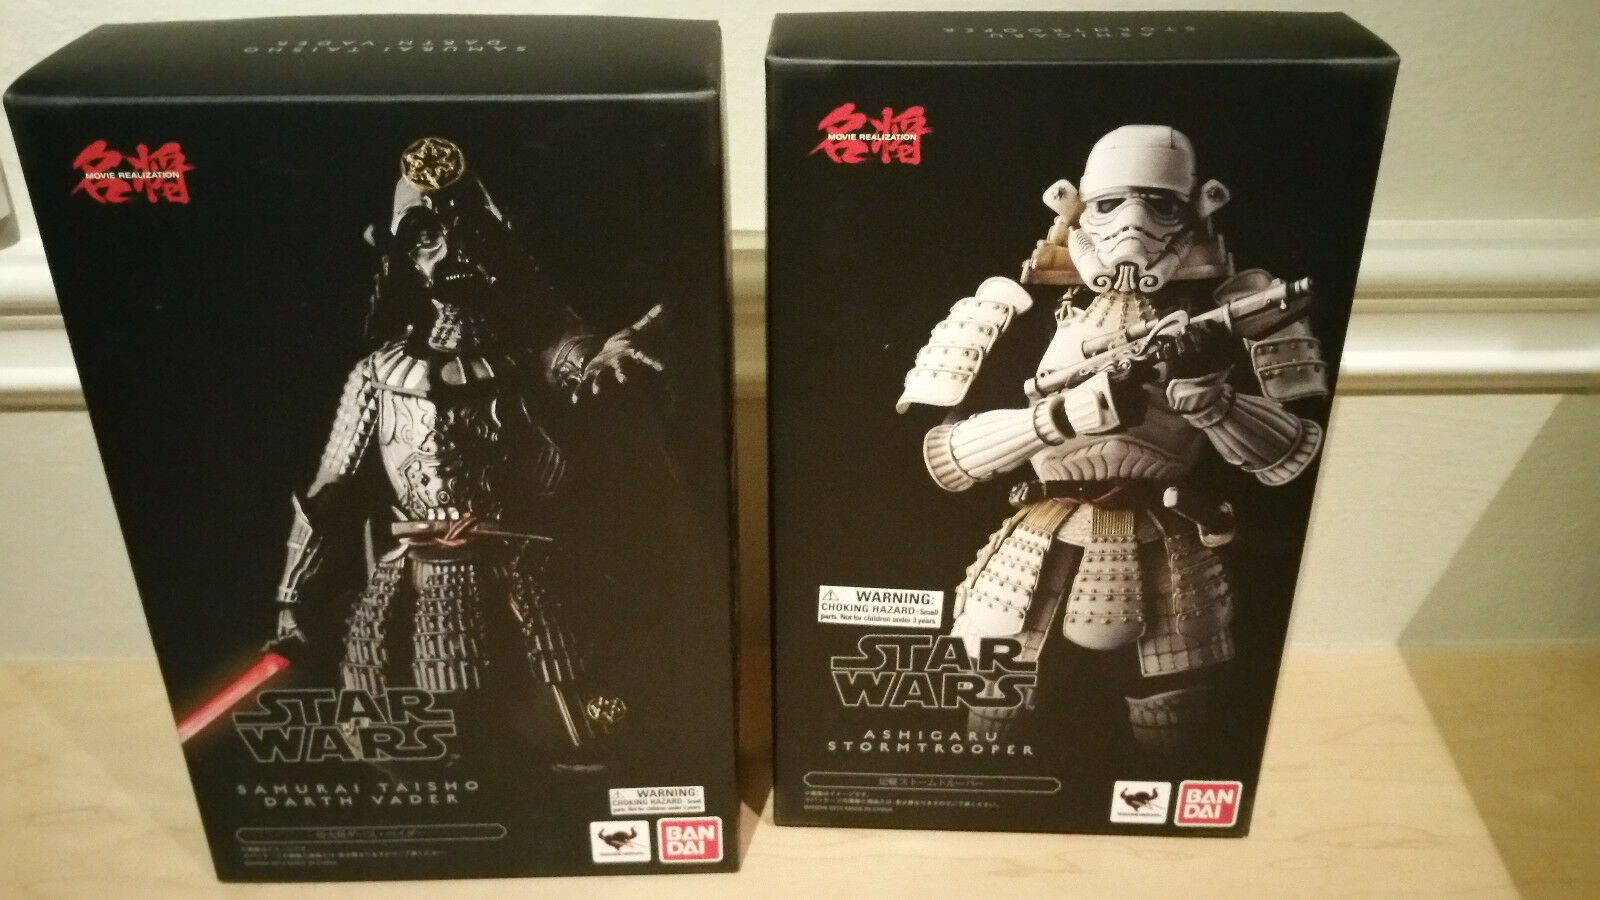 Bandai Tamashii Star Wars Samurai Darth Vader & & & Ashigaru Stormtrooper Figure Set 082a23